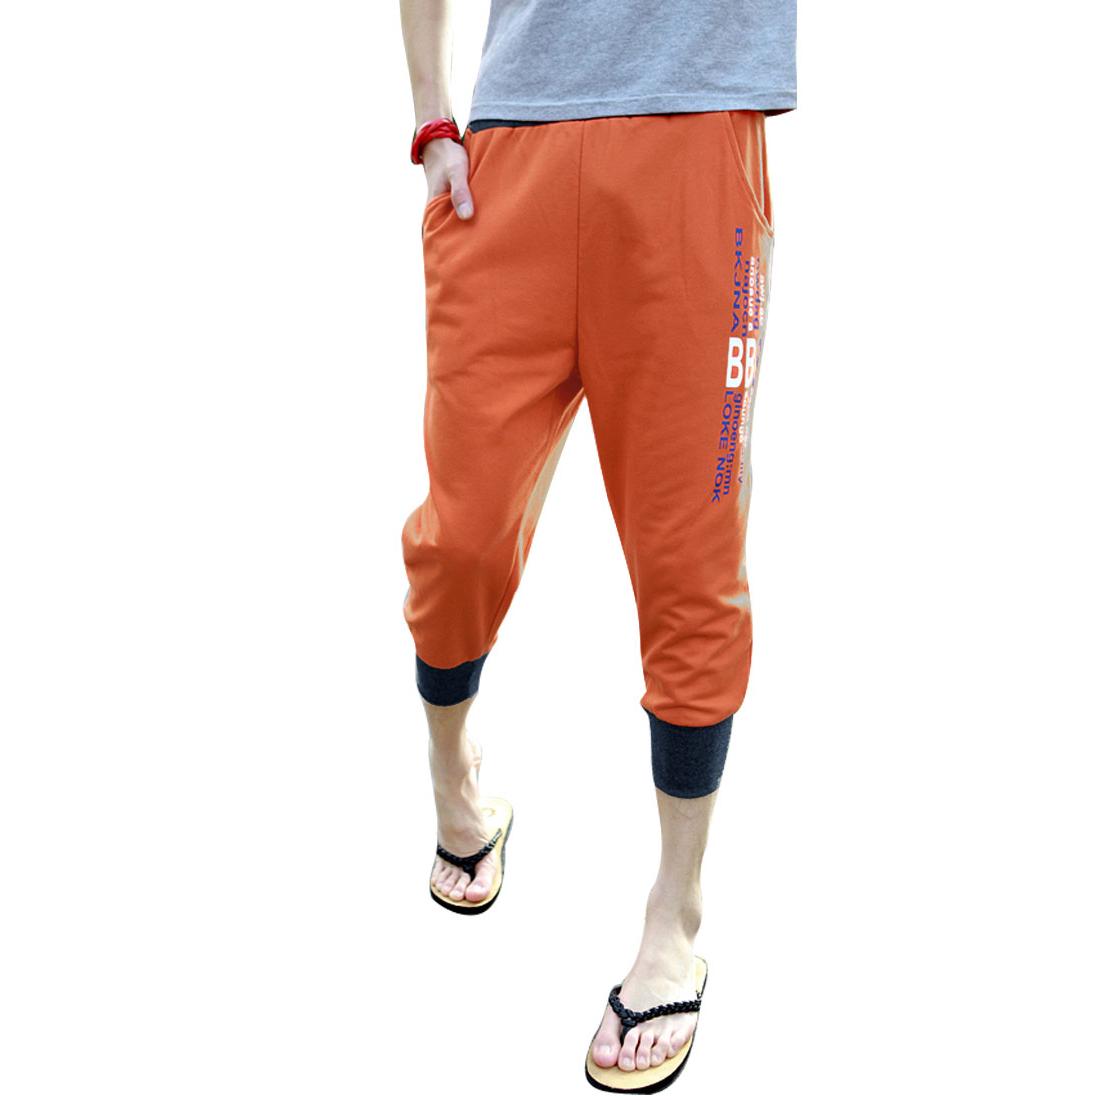 Man Fashion Drawstring Waist Design Side Slant Pockets Orange Short Pants W29